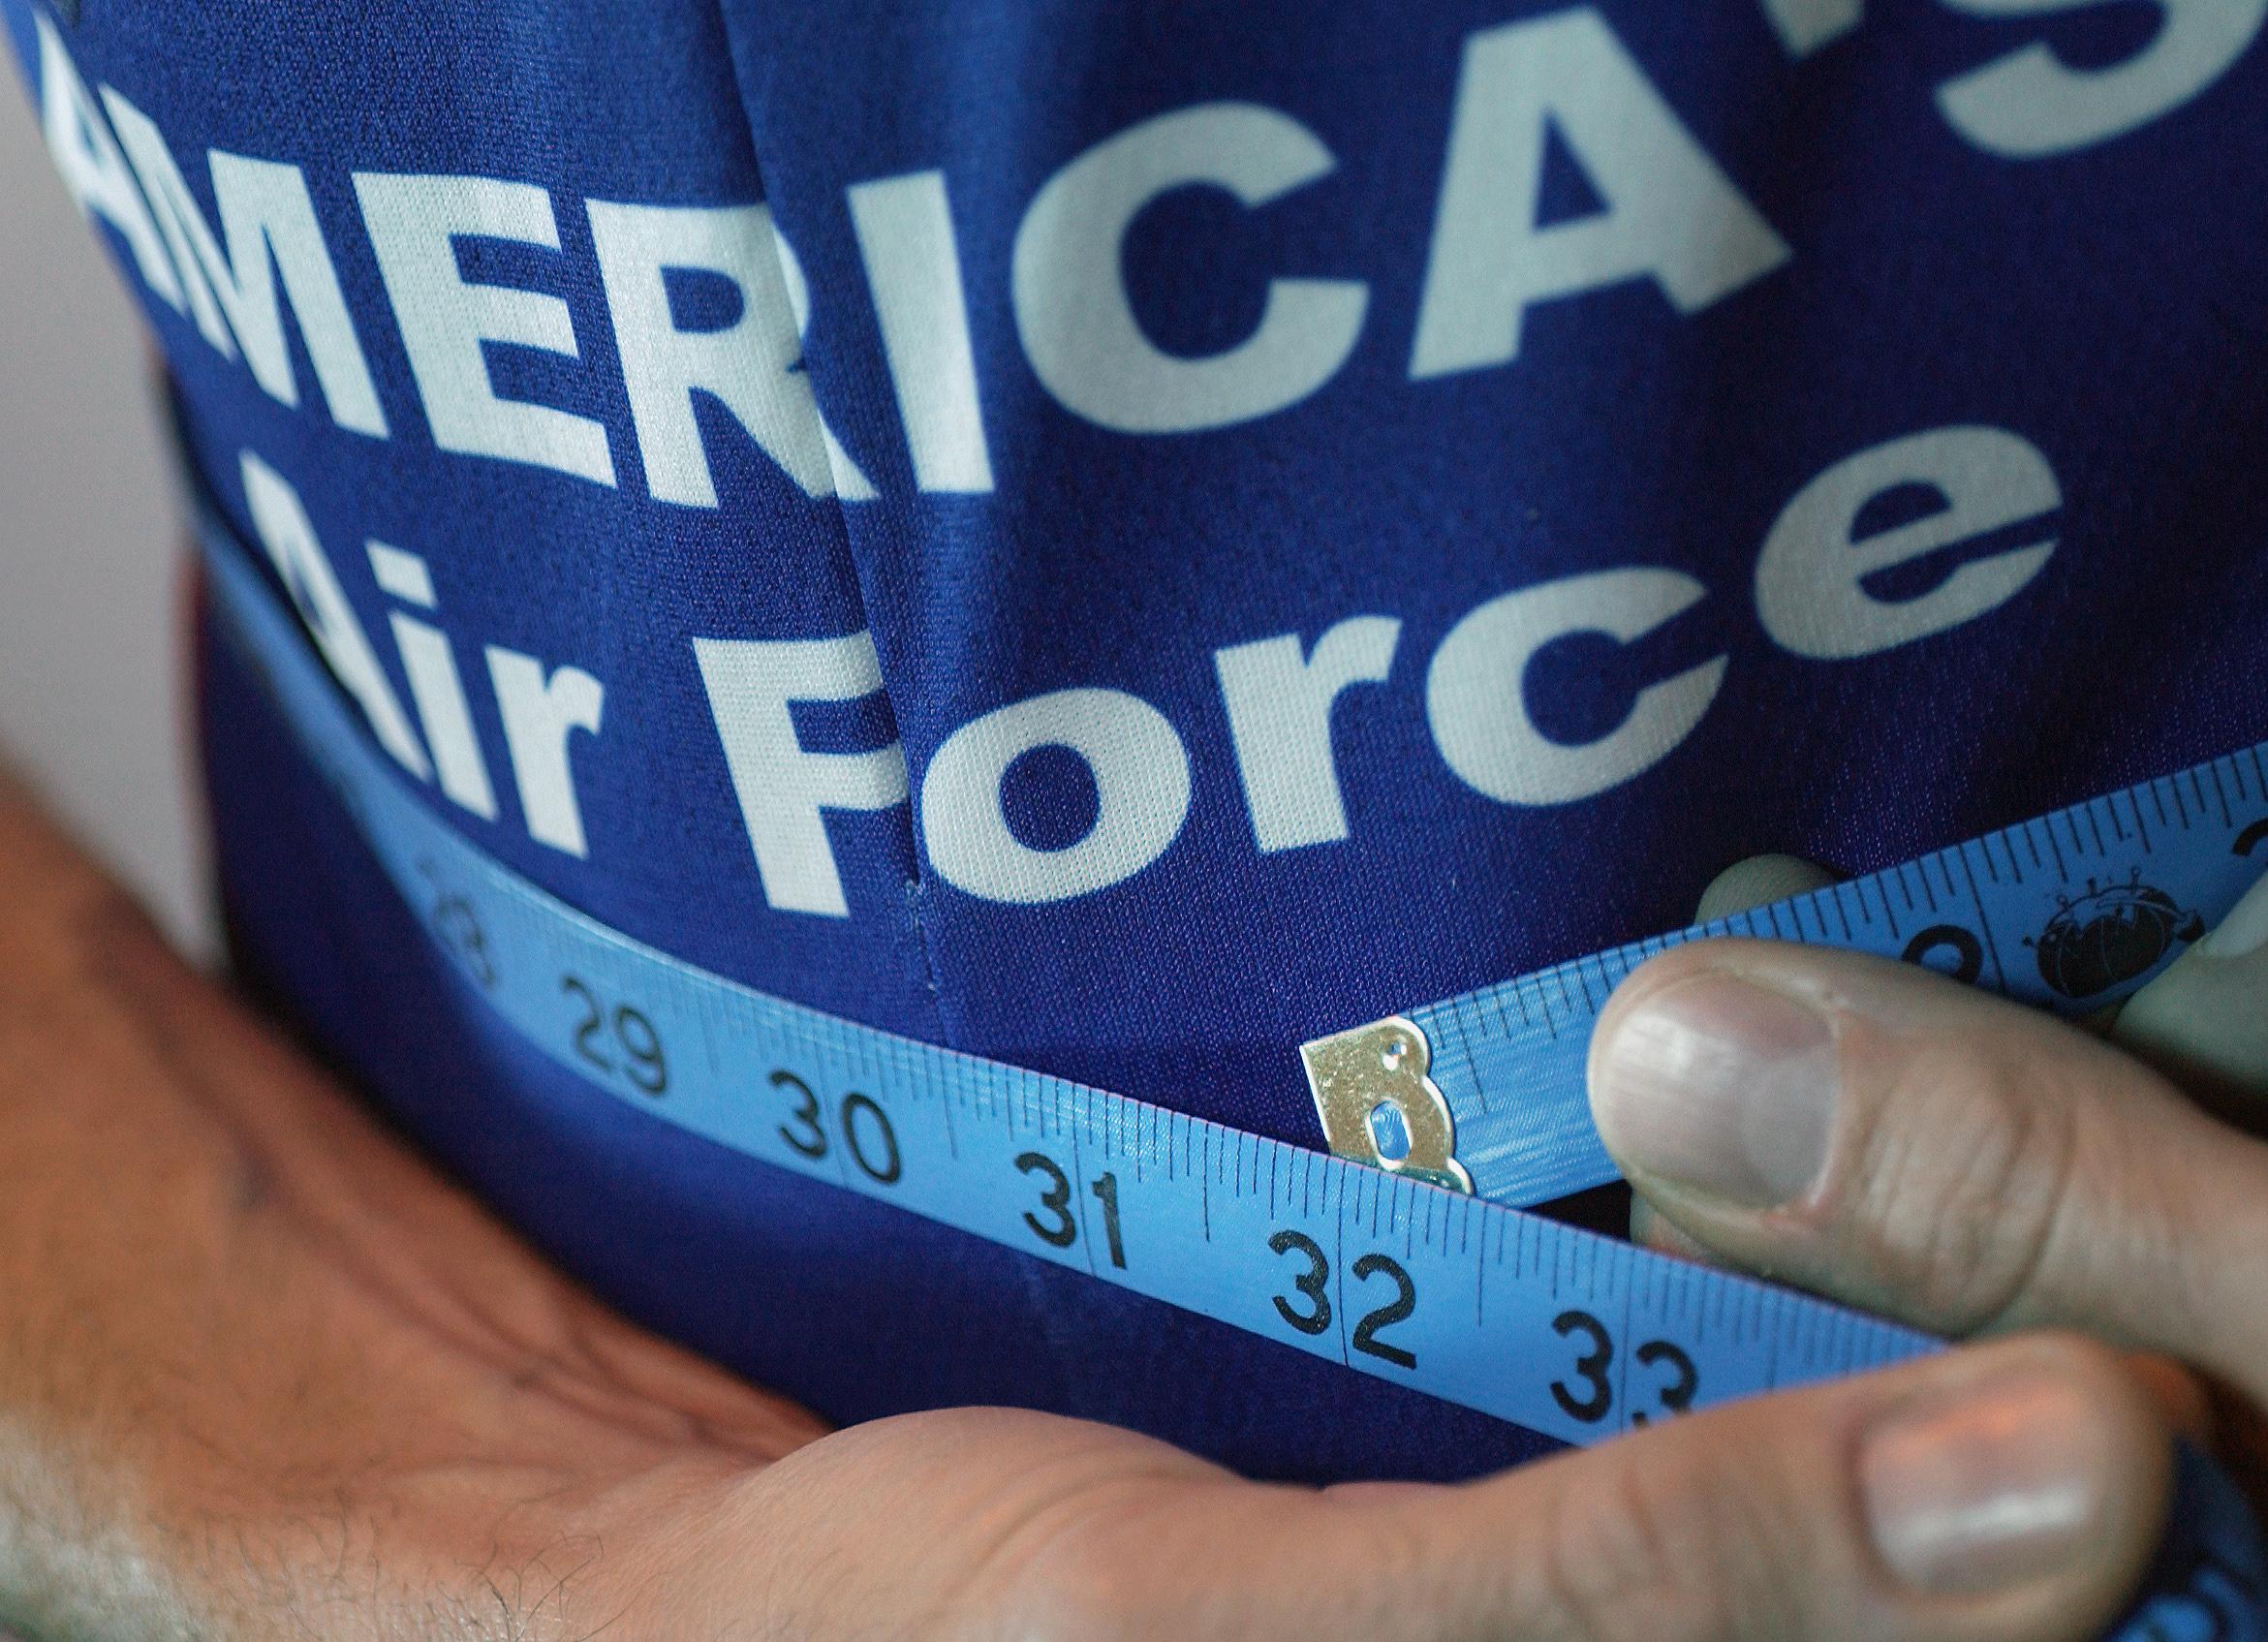 Tape Measurement Chart: Waist size reflects whole health e U.S. Air Force e Article Display,Chart